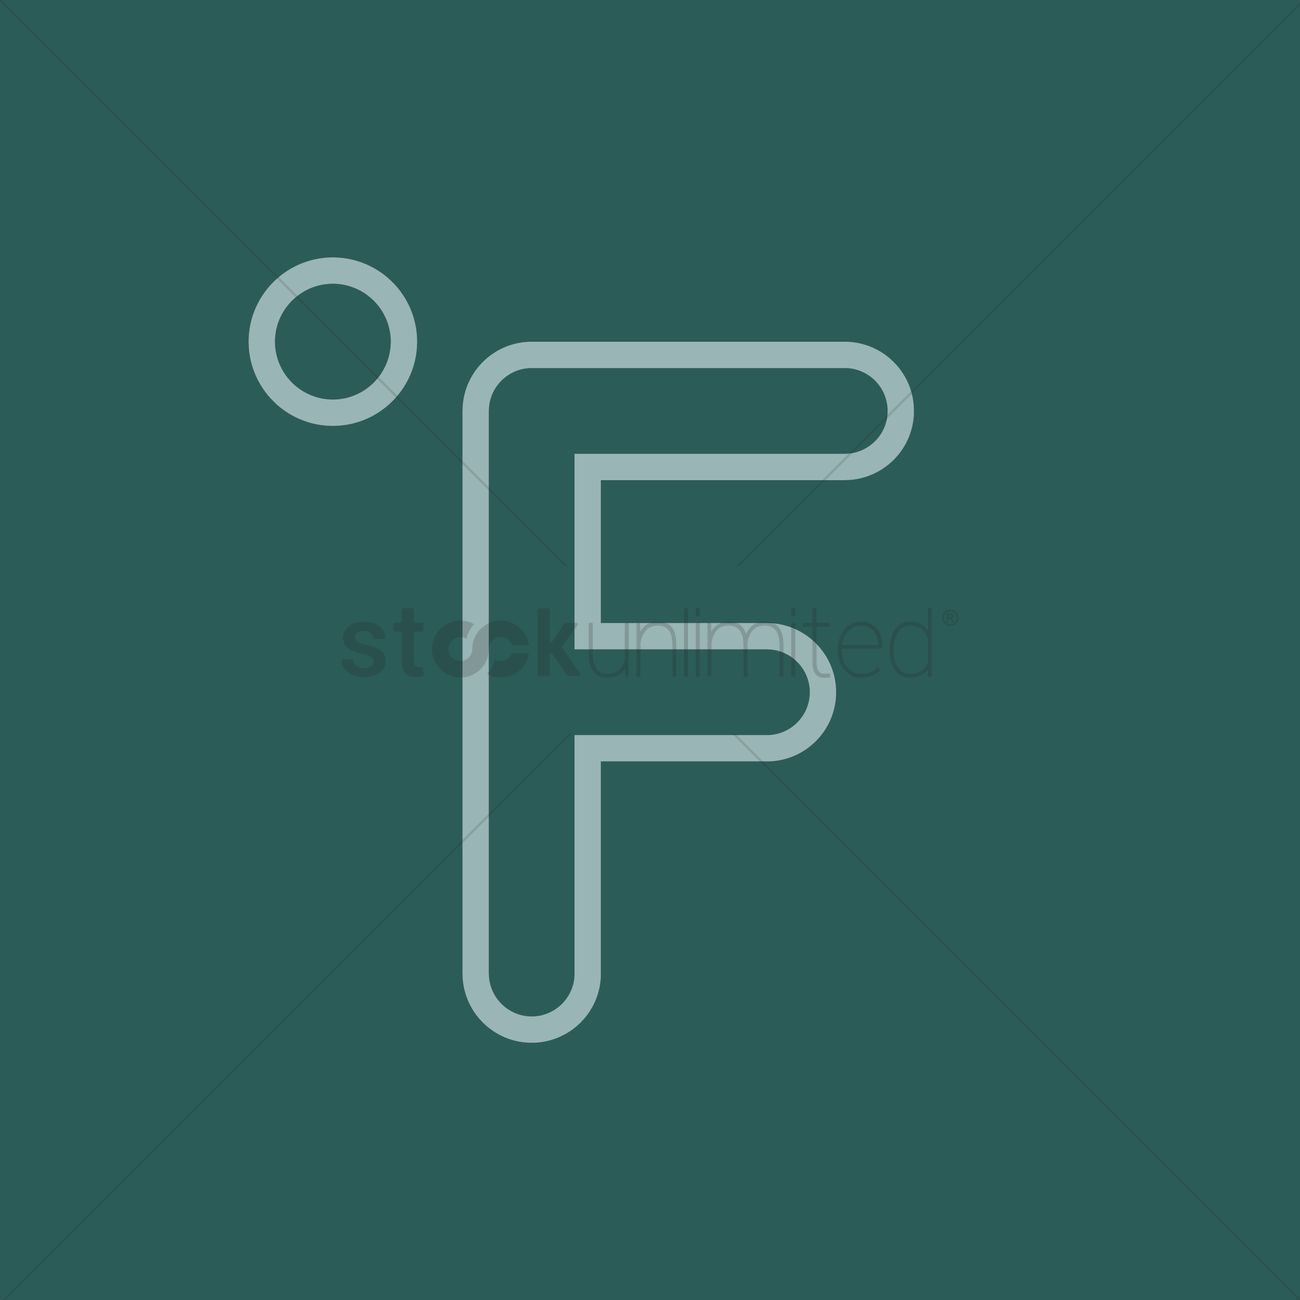 Fahrenheit symbol vector image 1370334 stockunlimited fahrenheit symbol vector graphic biocorpaavc Choice Image